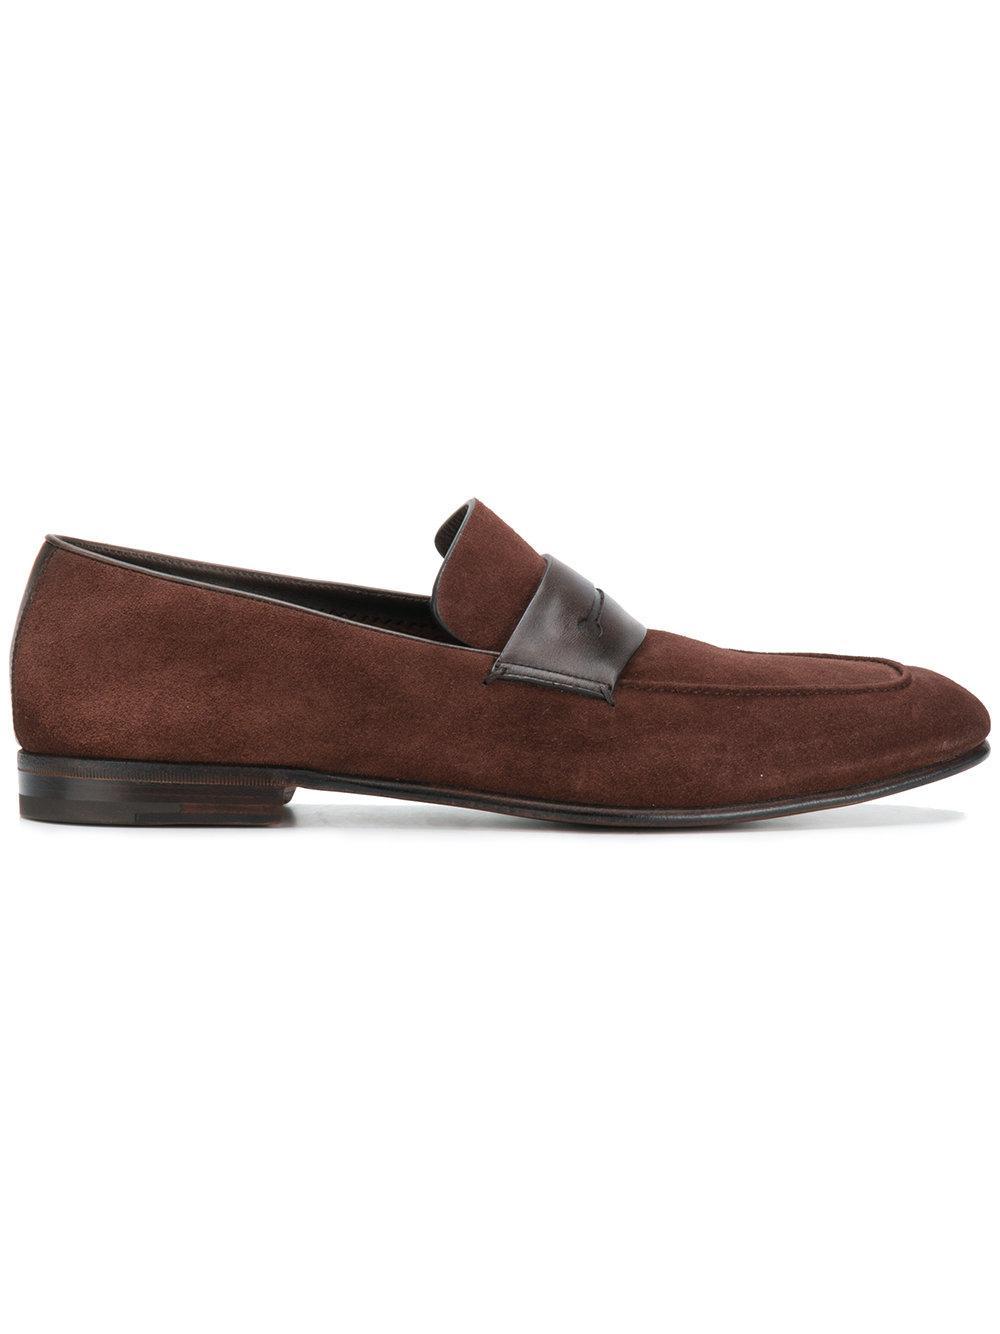 Ermenegildo Zegna Contrast Strap Loafers - Brown